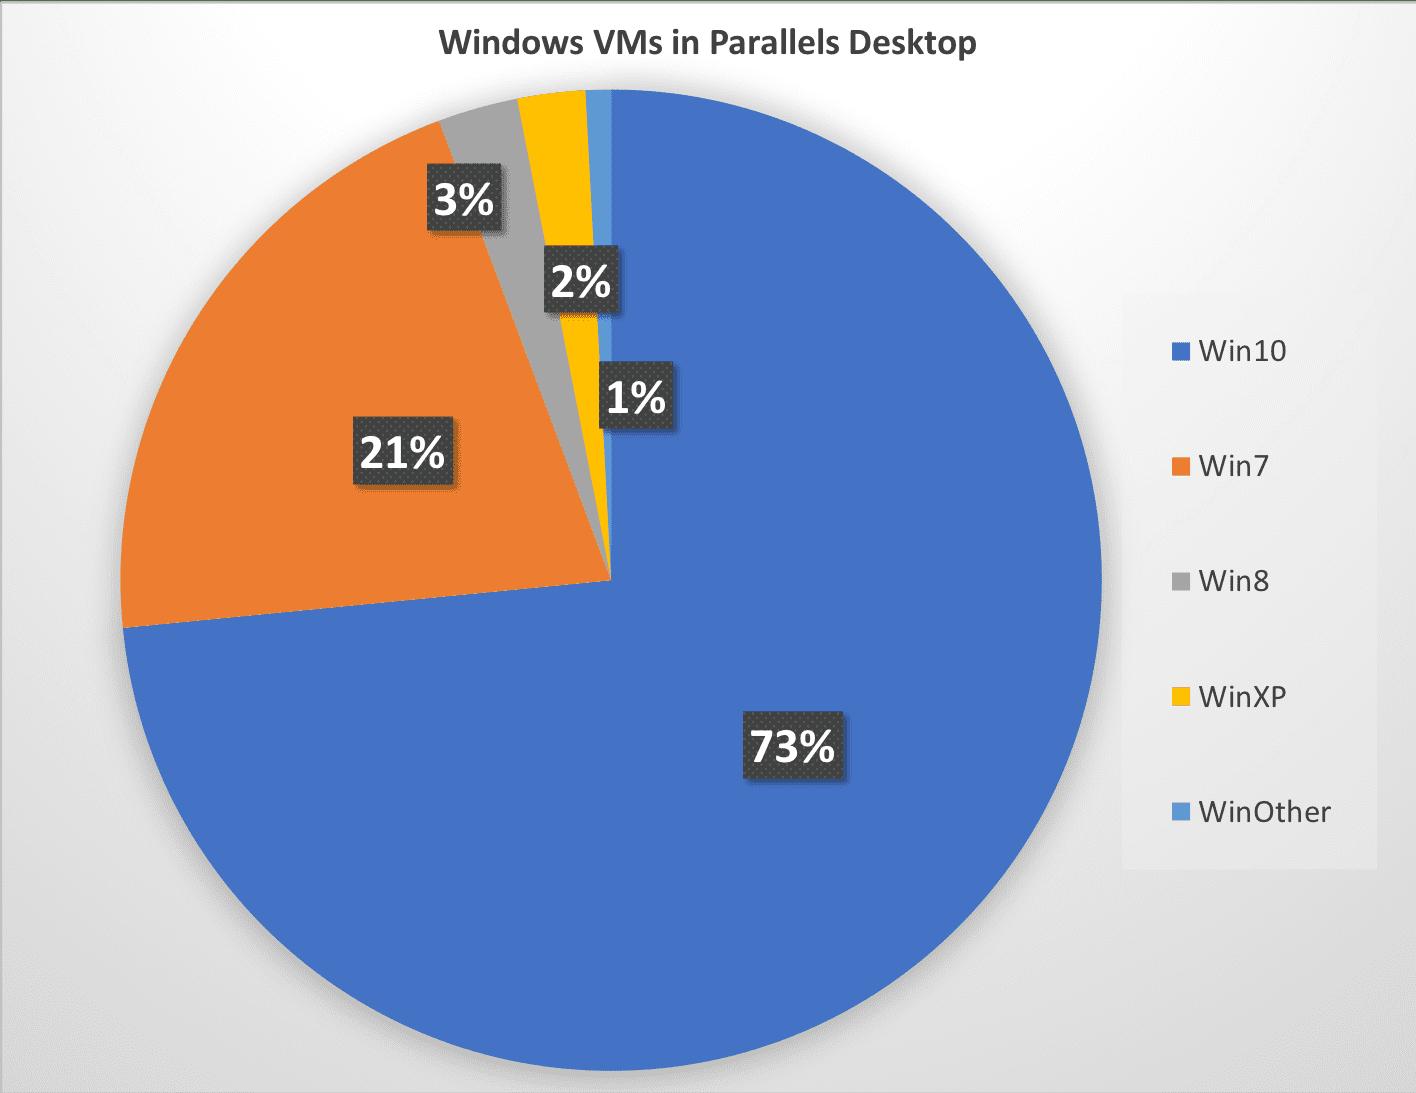 Windows VMs in Parallels Desktop